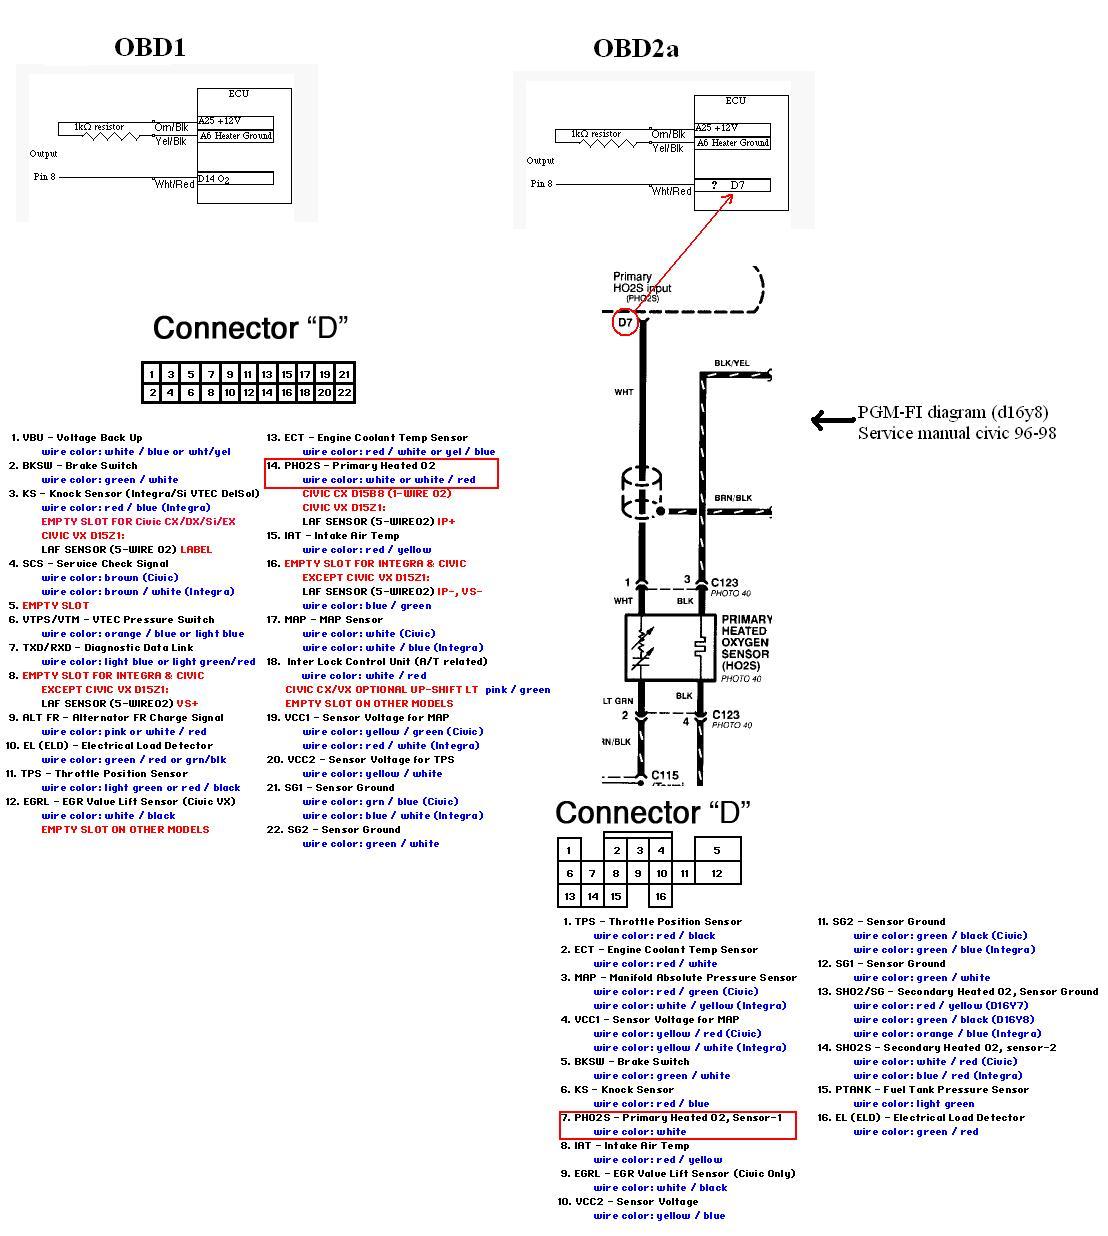 honda obd2 wiring diagram ford taurus stereo o2 sensor ek9 org jdm civic type r